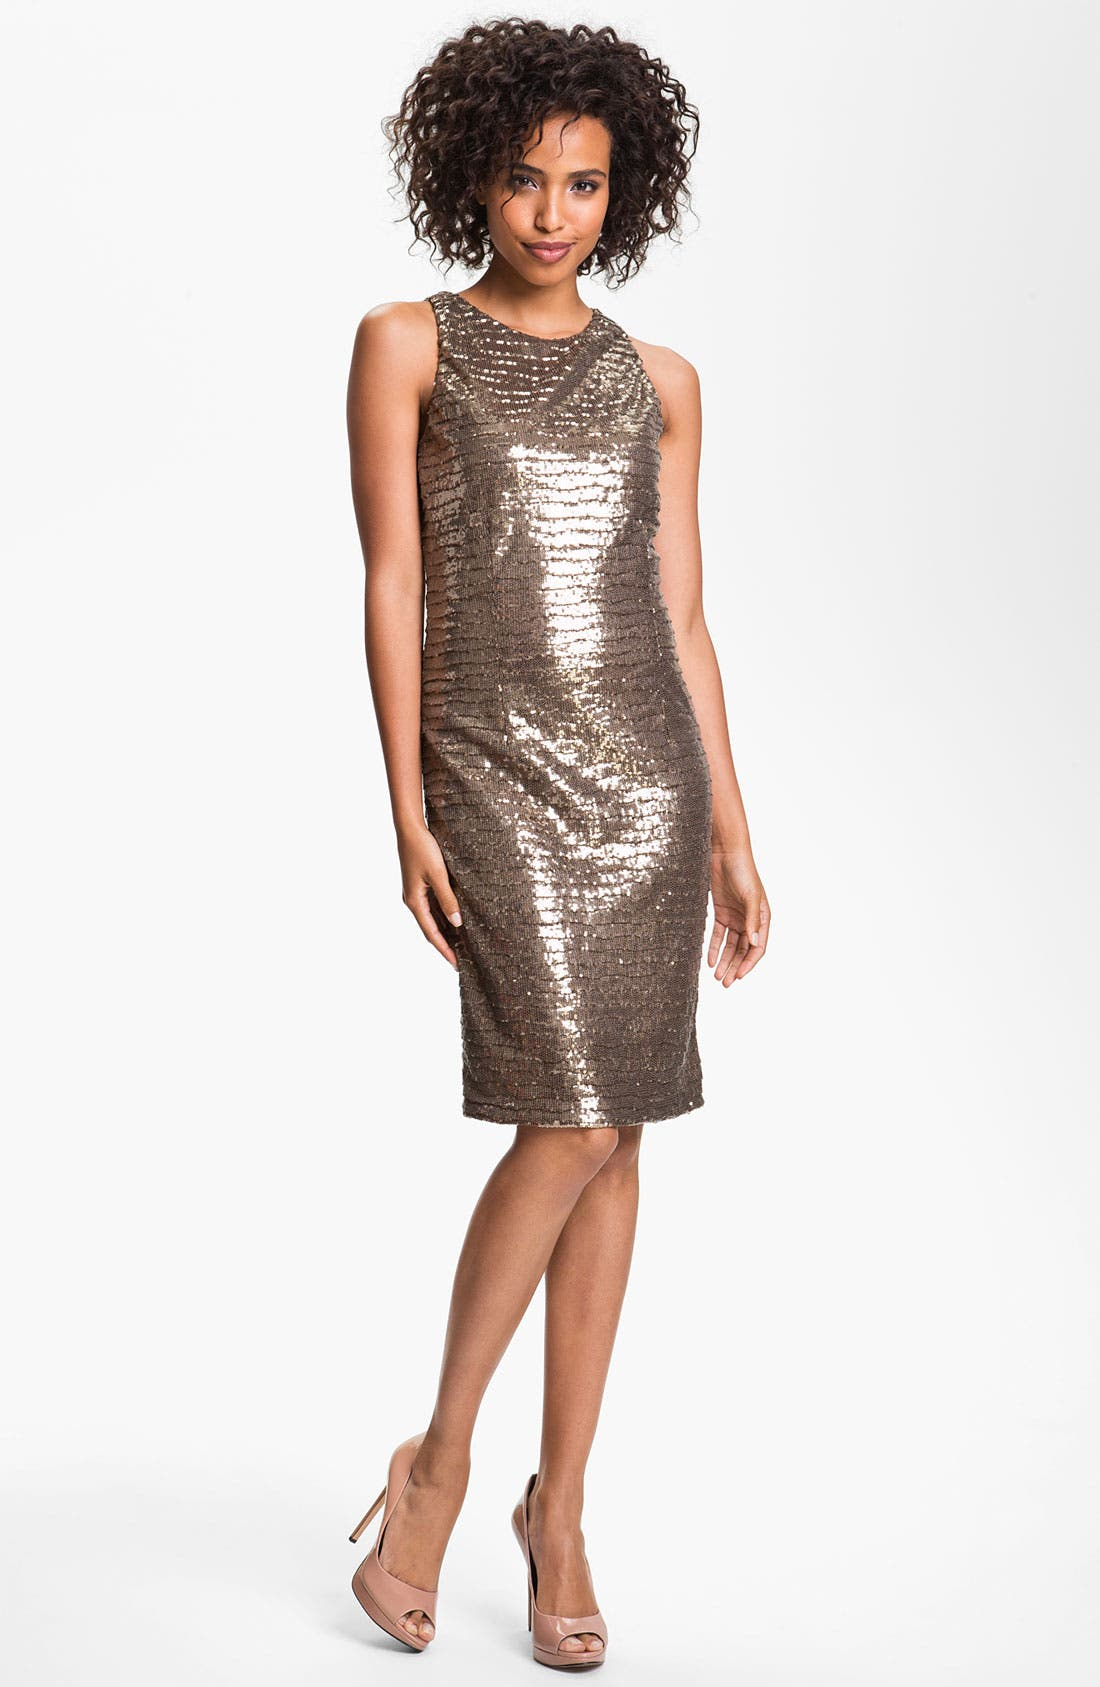 Alternate Image 1 Selected - Betsy & Adam Back Cutout Metallic Sequin Dress